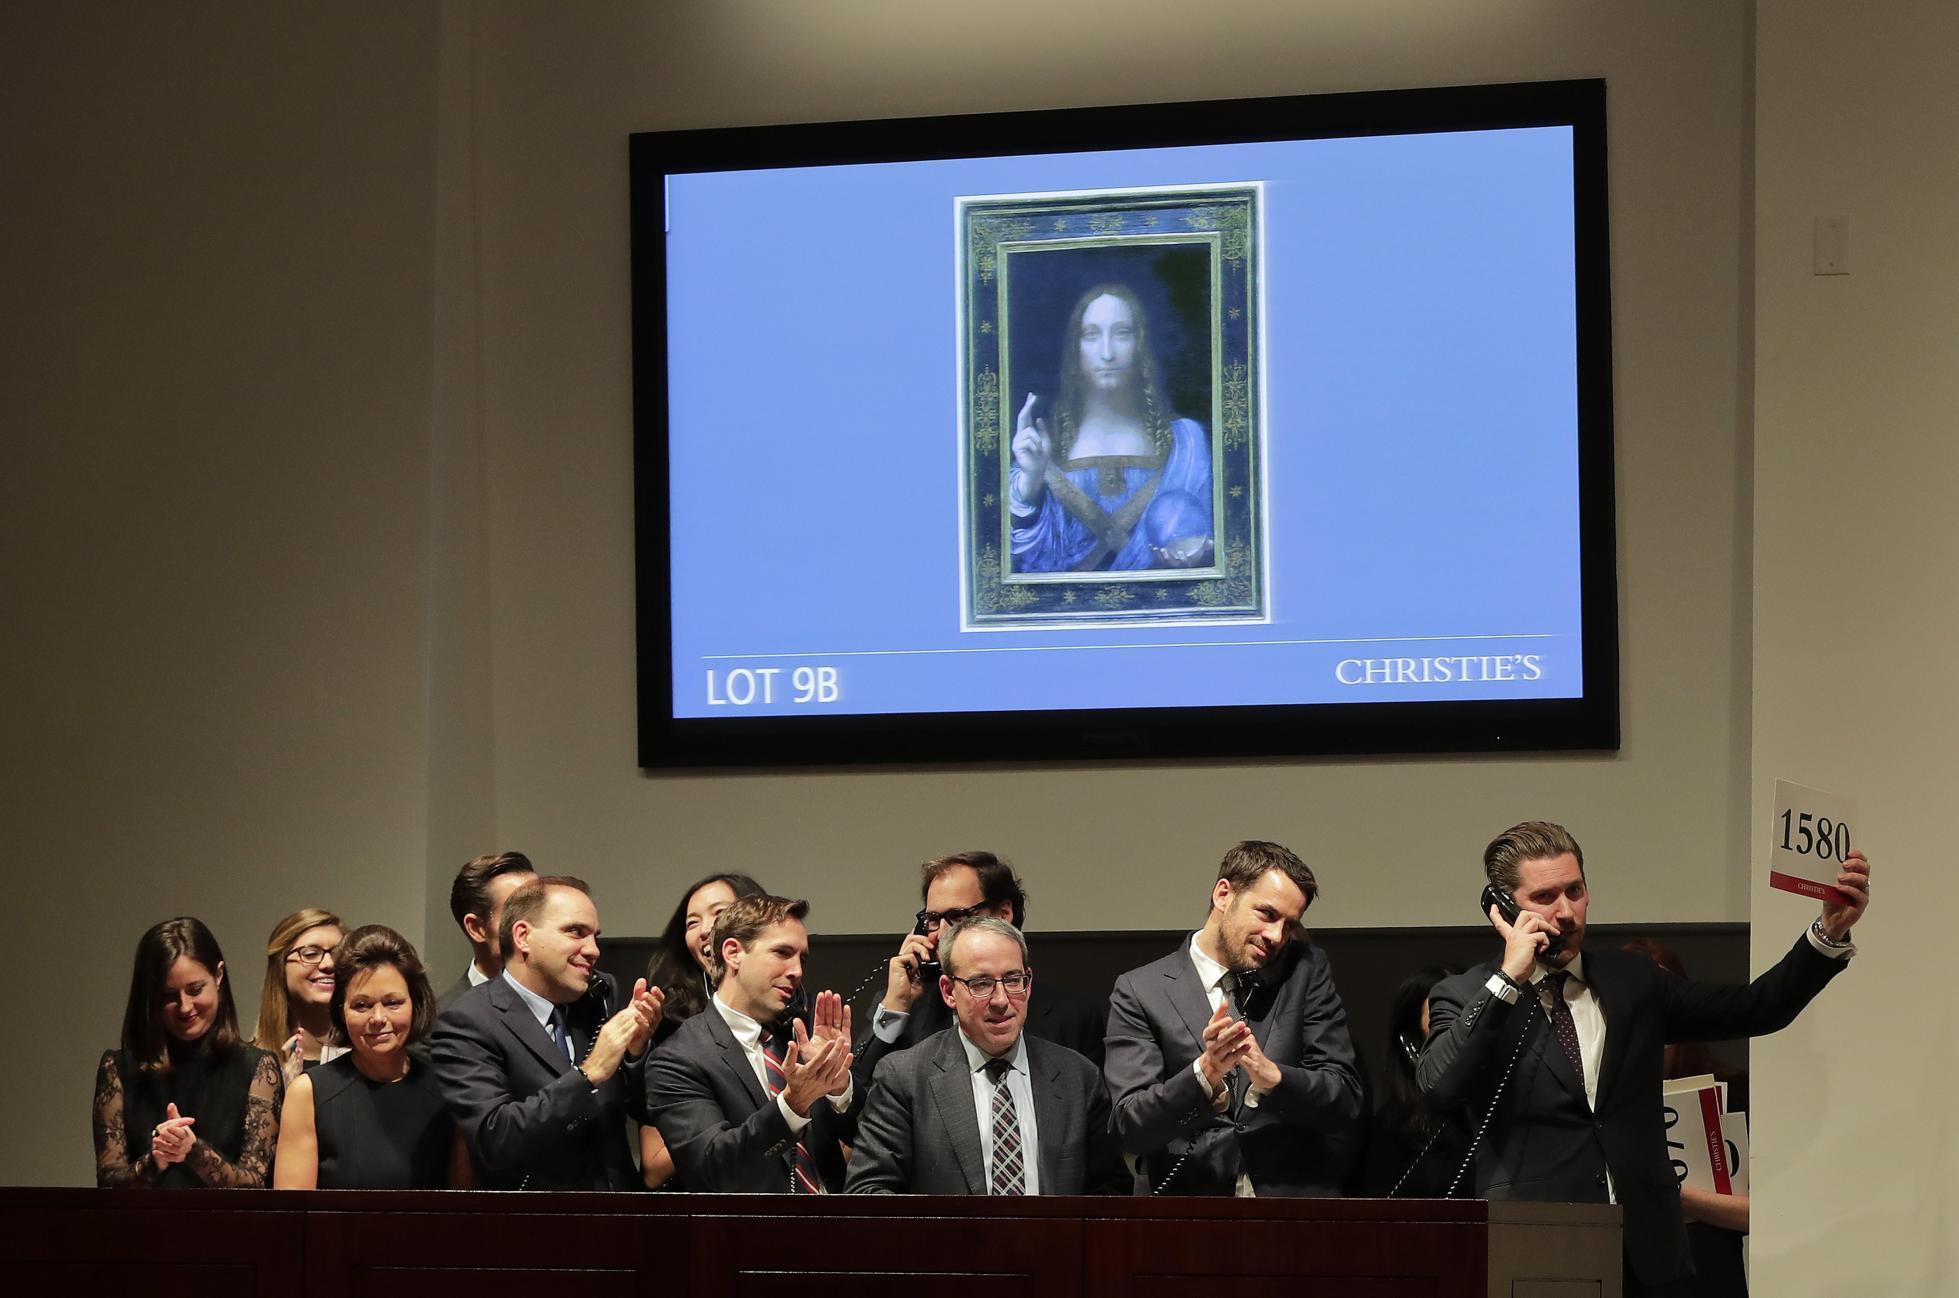 Salvator Mundi Mohammed bin Salman Saudi prince Louvre